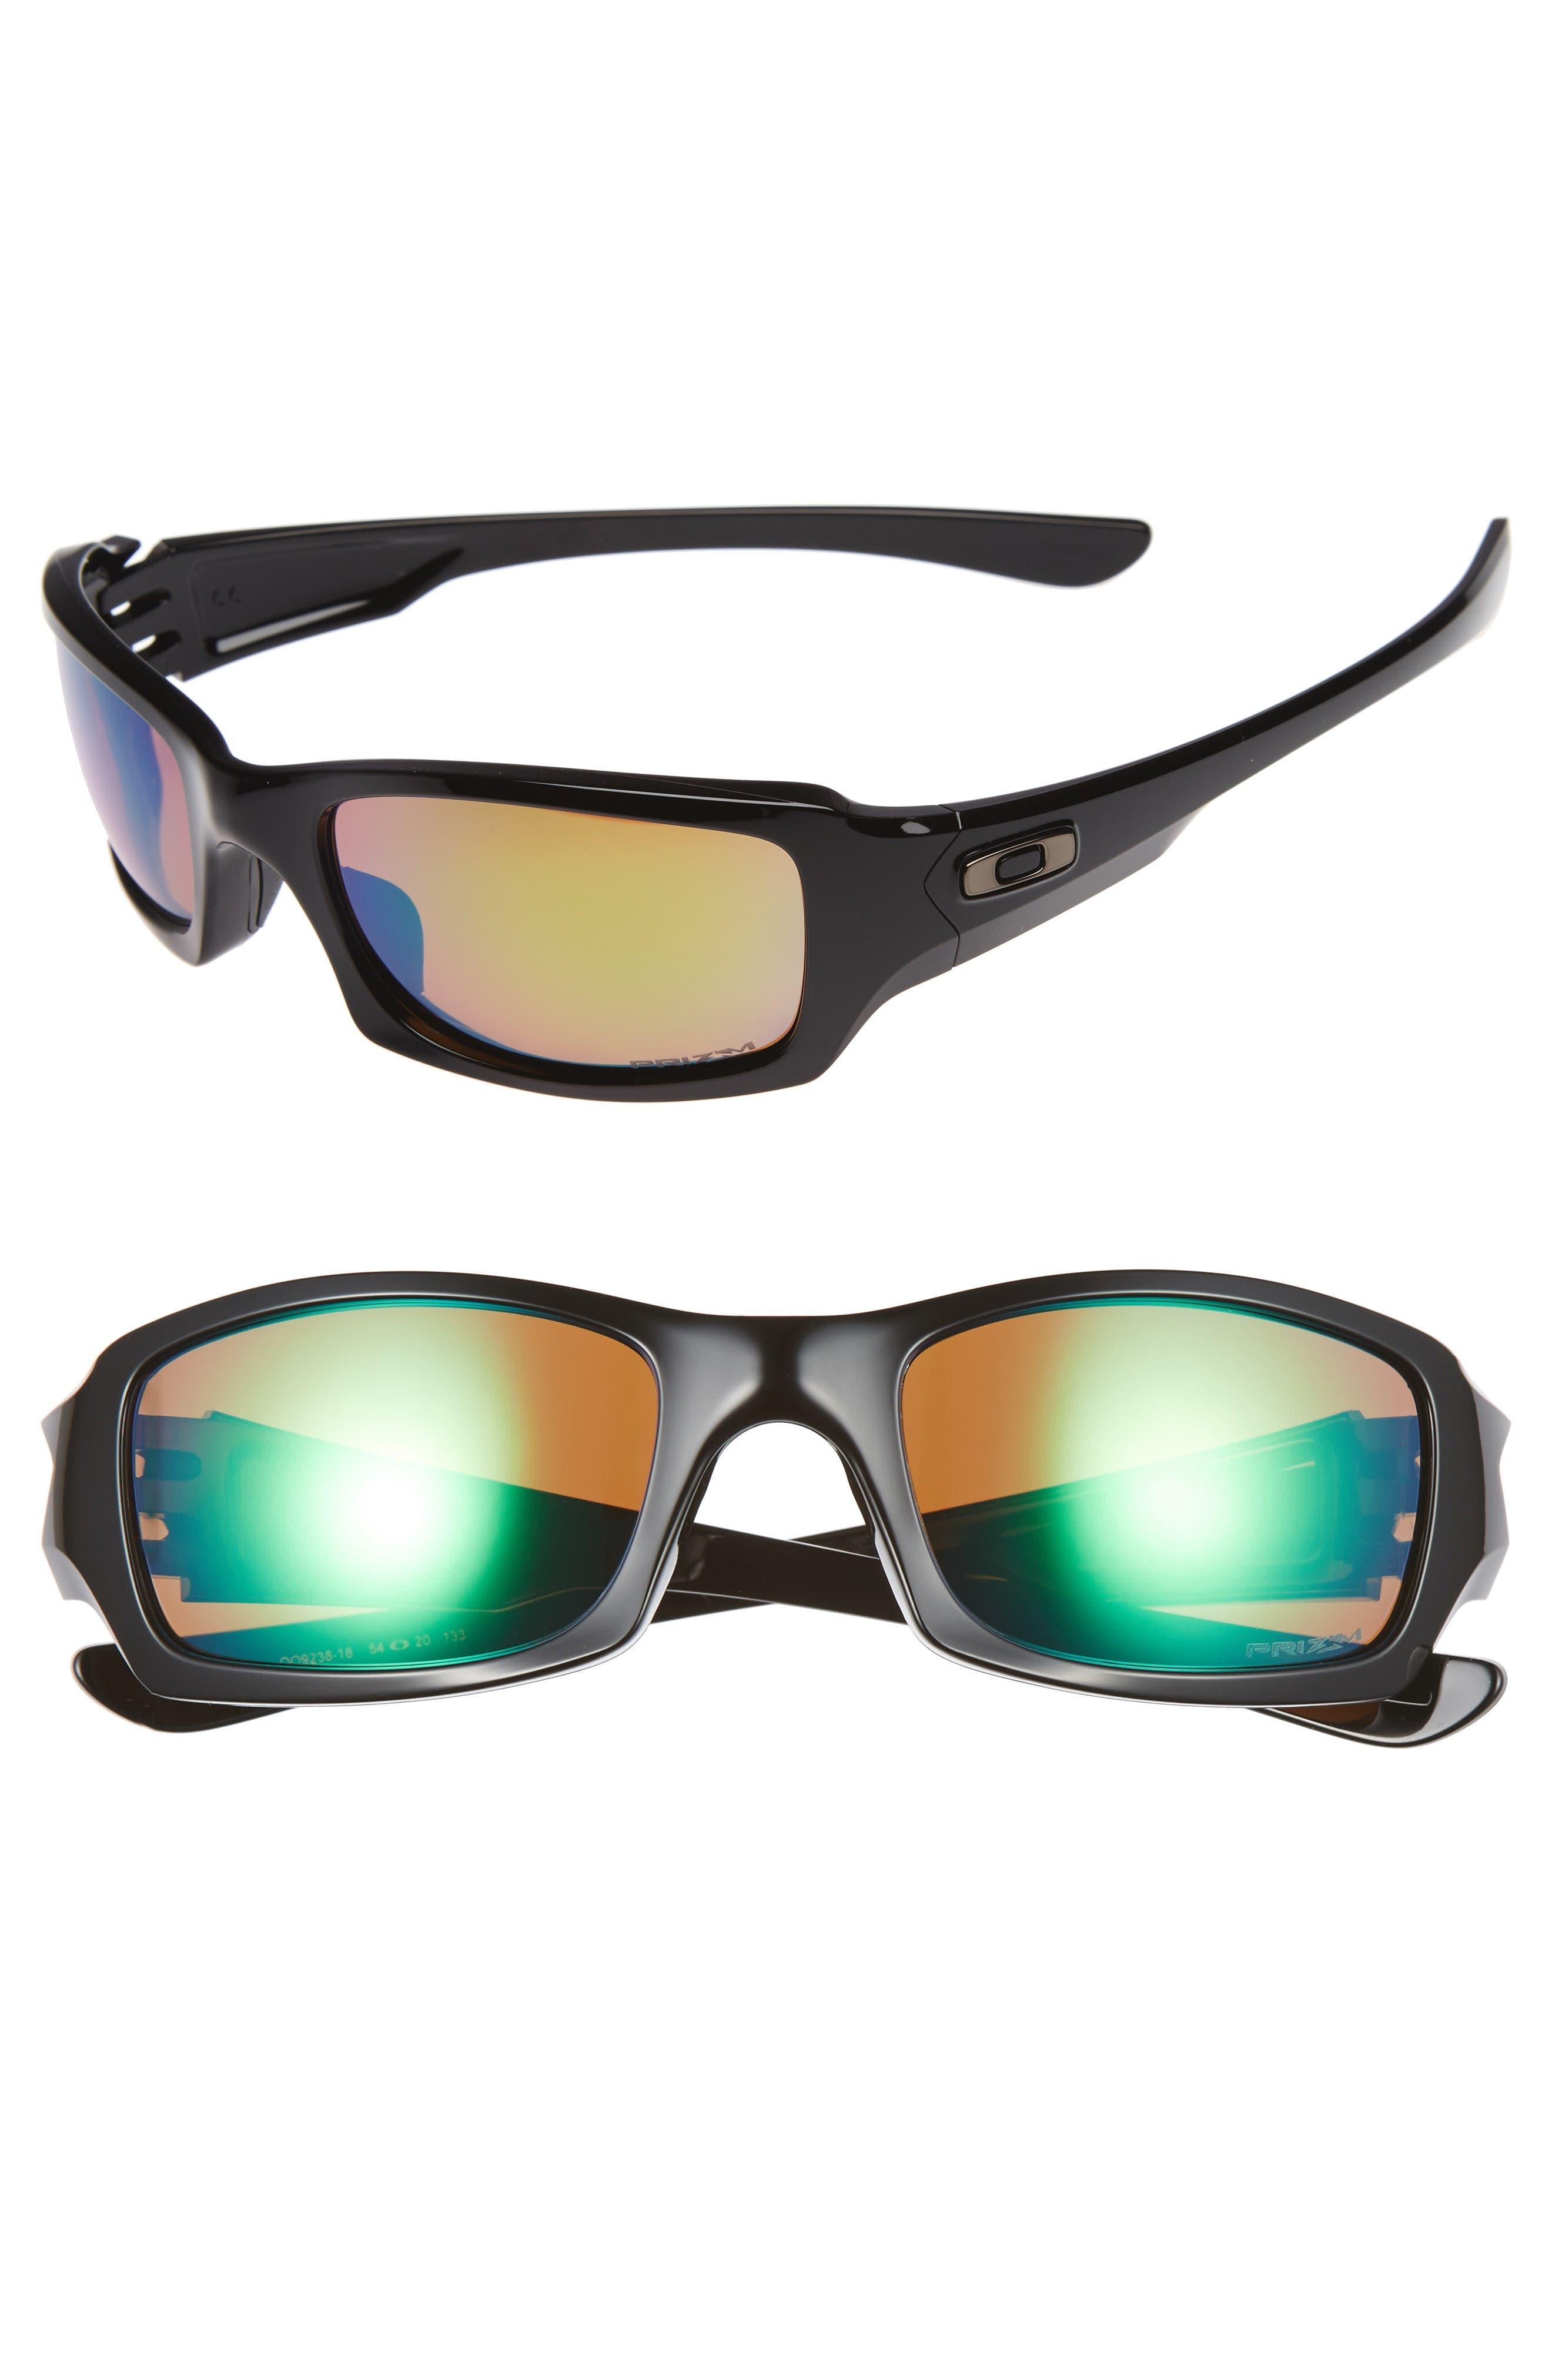 Fives Squared H2O 54mm Polarized Sunglasses,                             Main thumbnail 1, color,                             Black